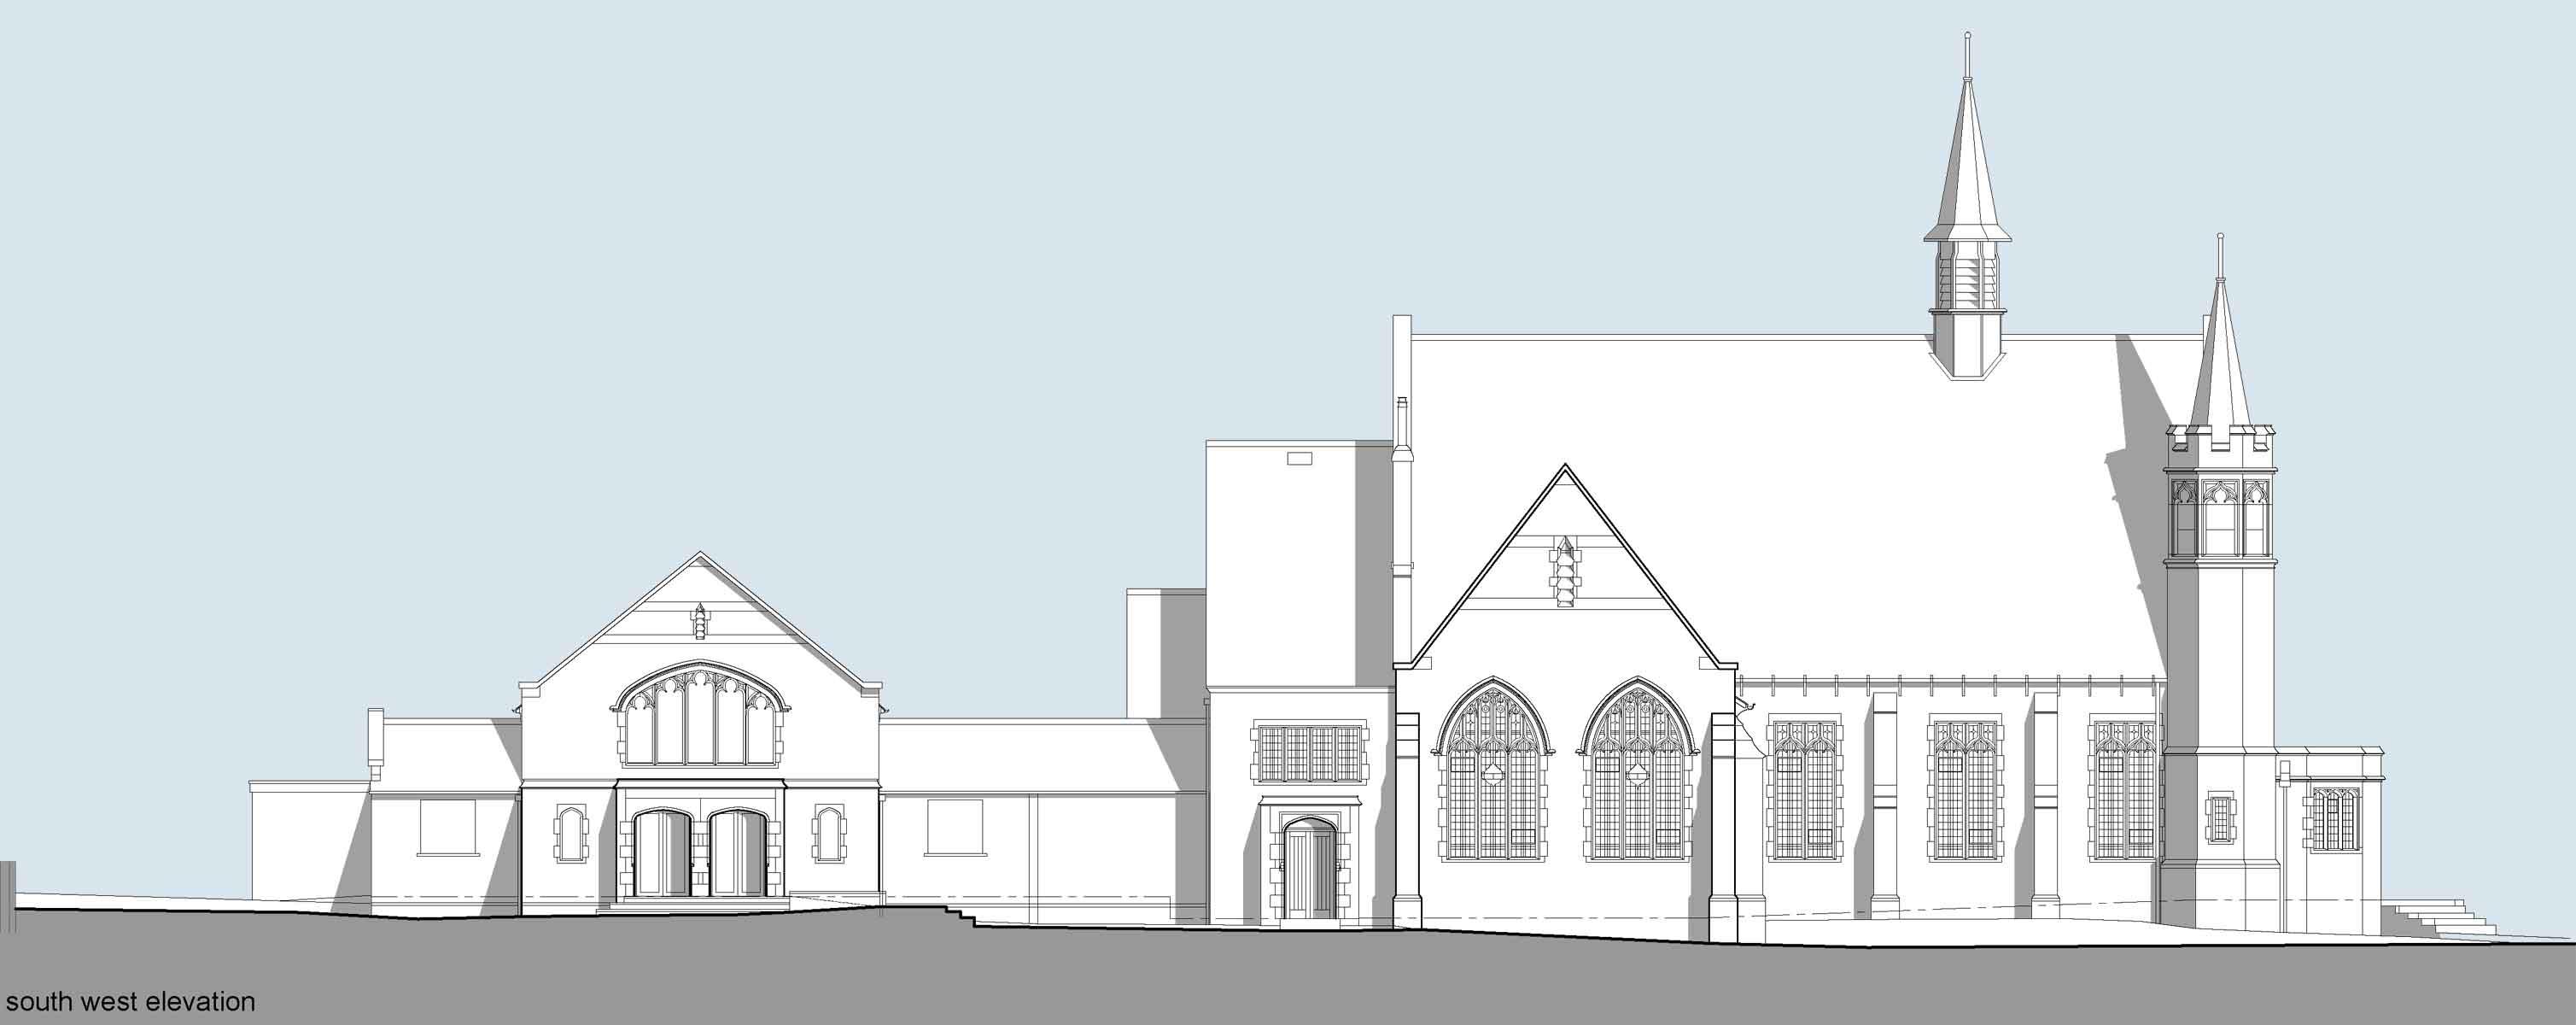 stubbin lane existing elevation sketch drawing of firth park methodist church